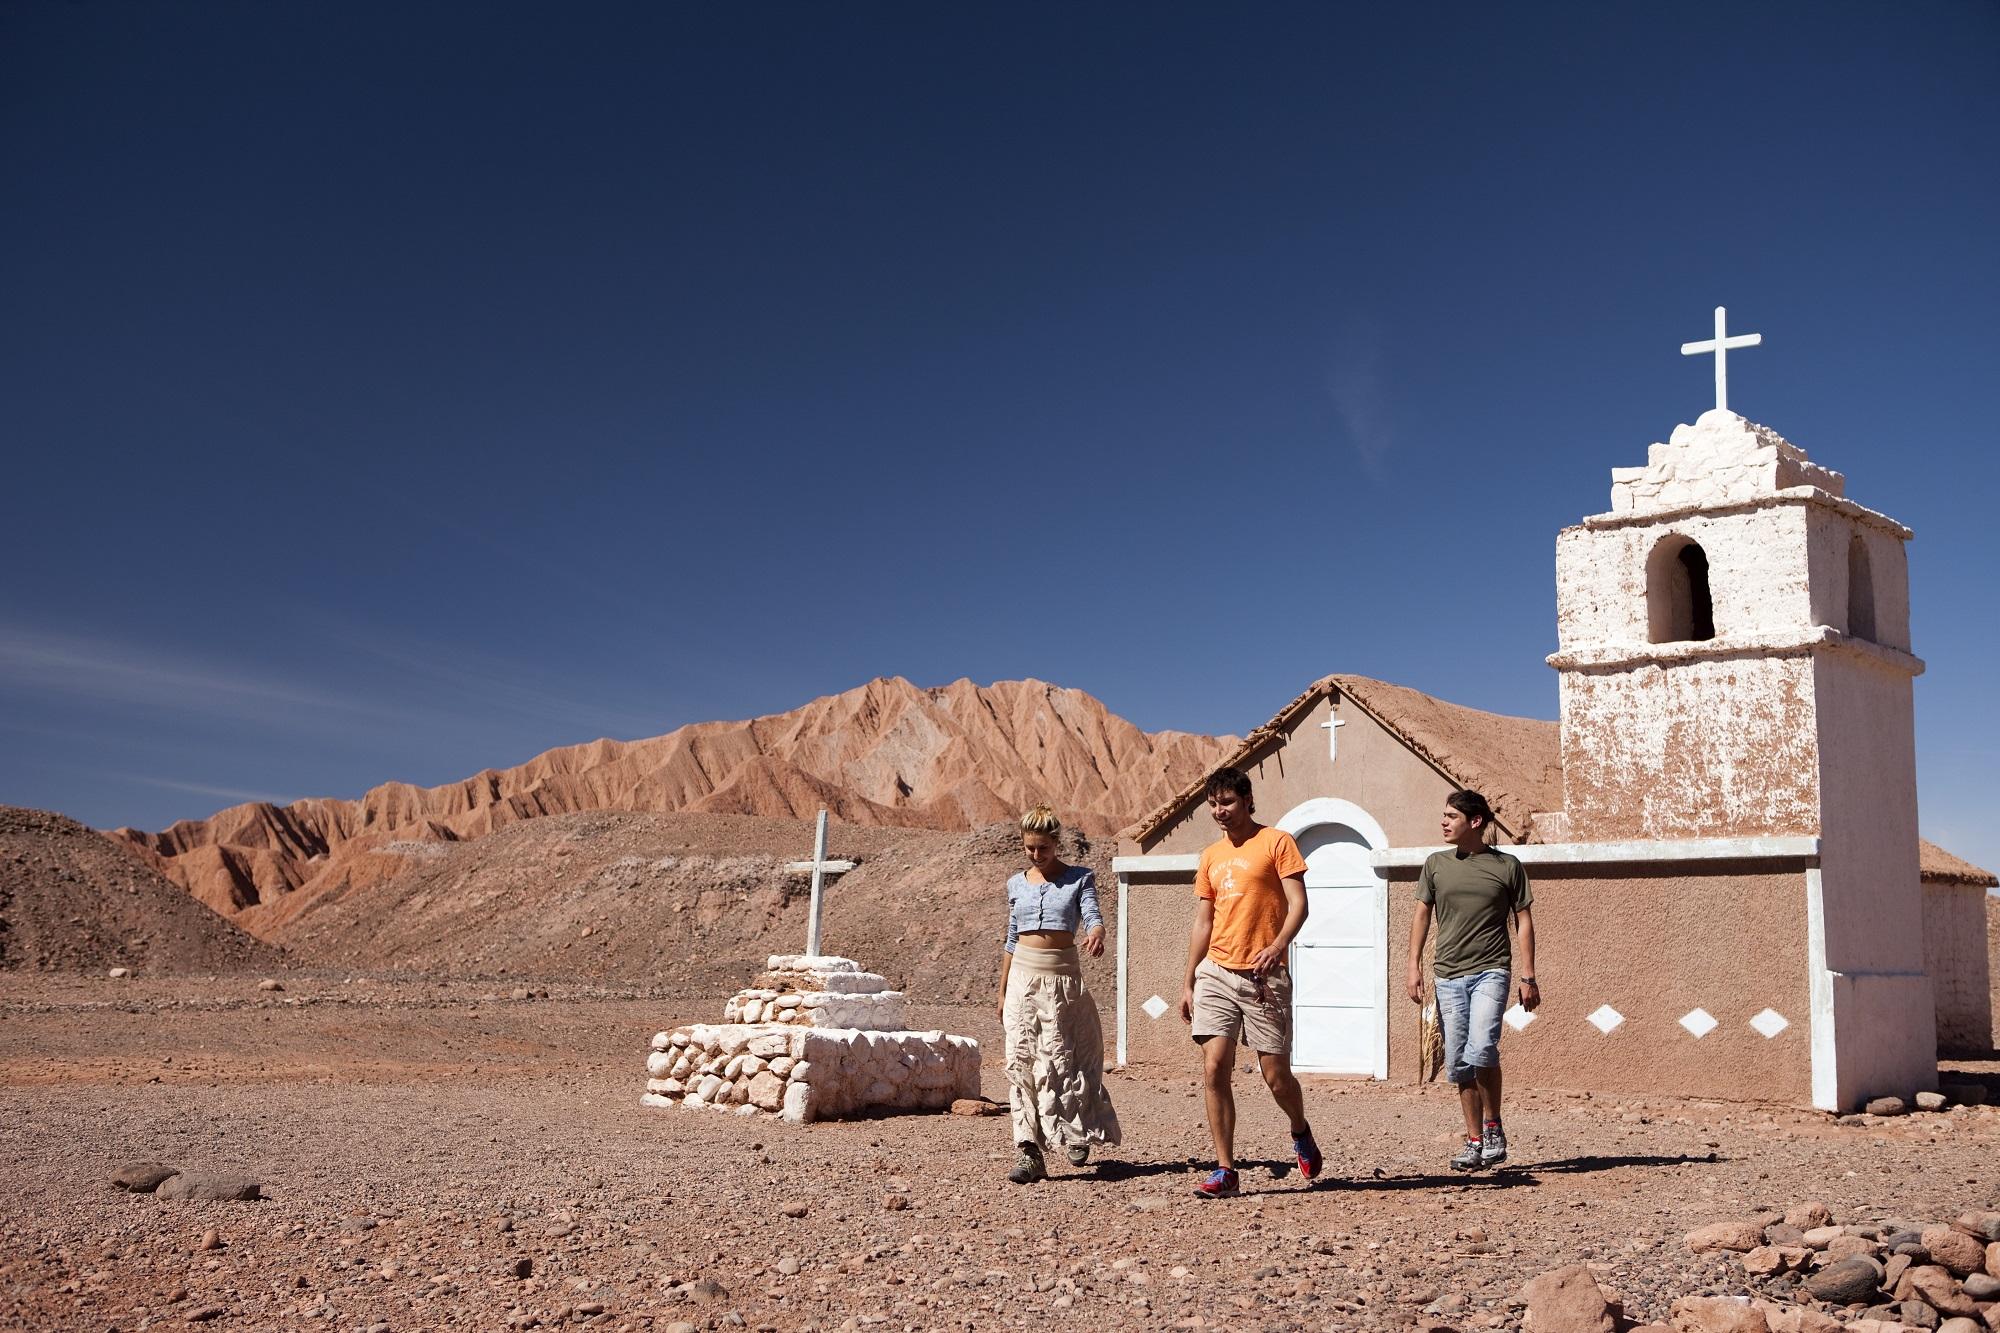 Torres del Paine and San Pedro de Atacama, a unique experience